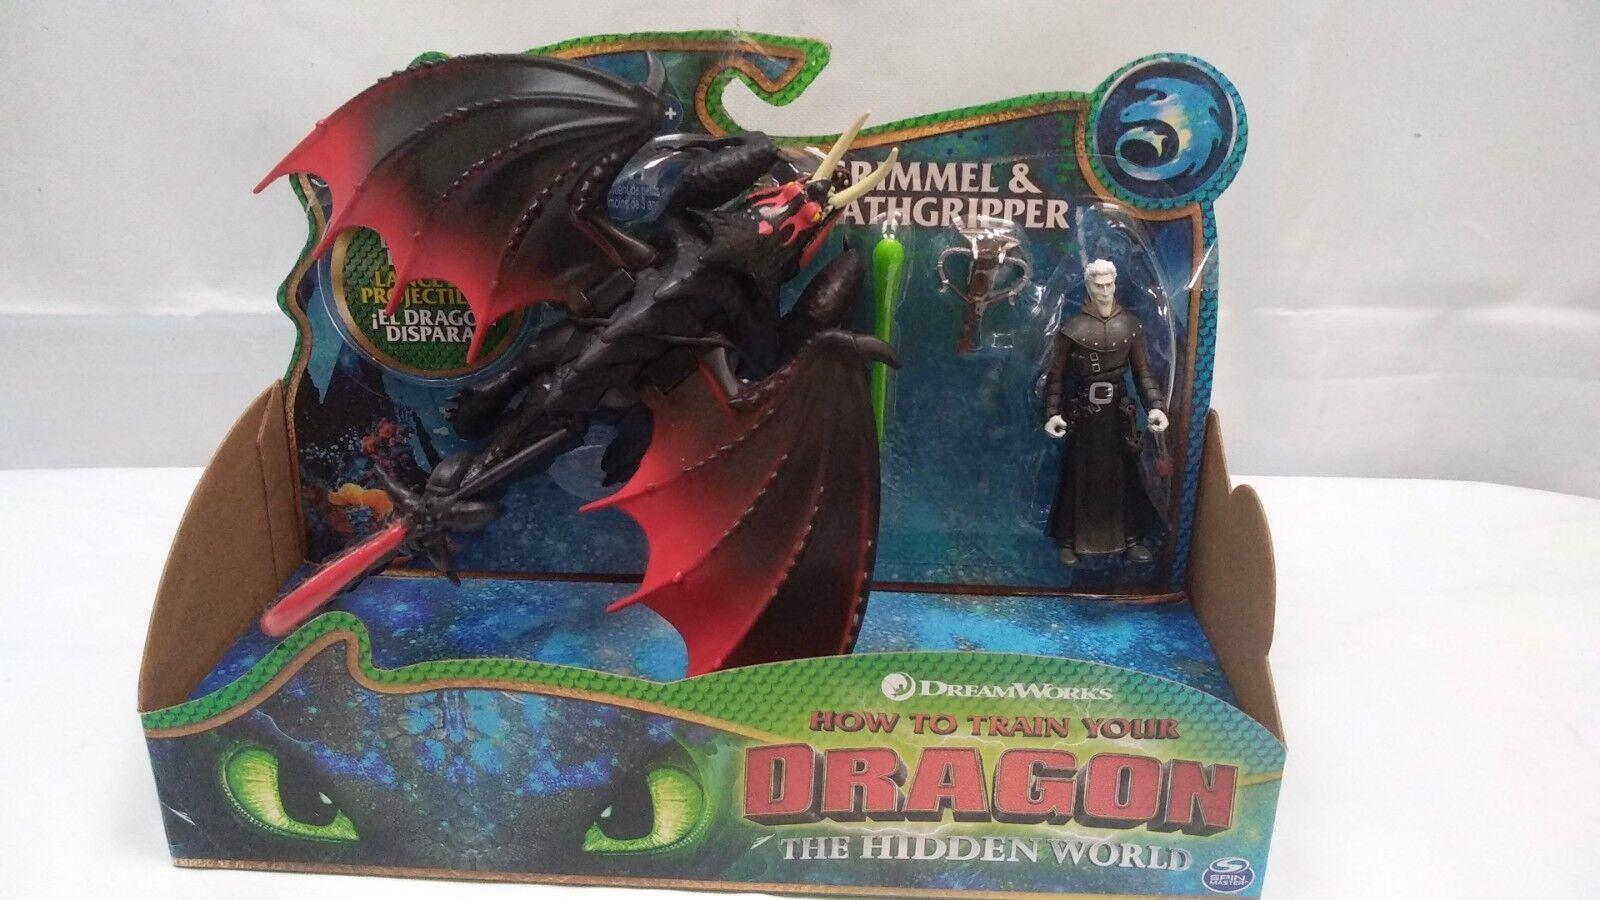 How to Train Your Dragon The Hidden World Grimmel Grimmel Grimmel & Deathgripper Playset Toy 69eca5